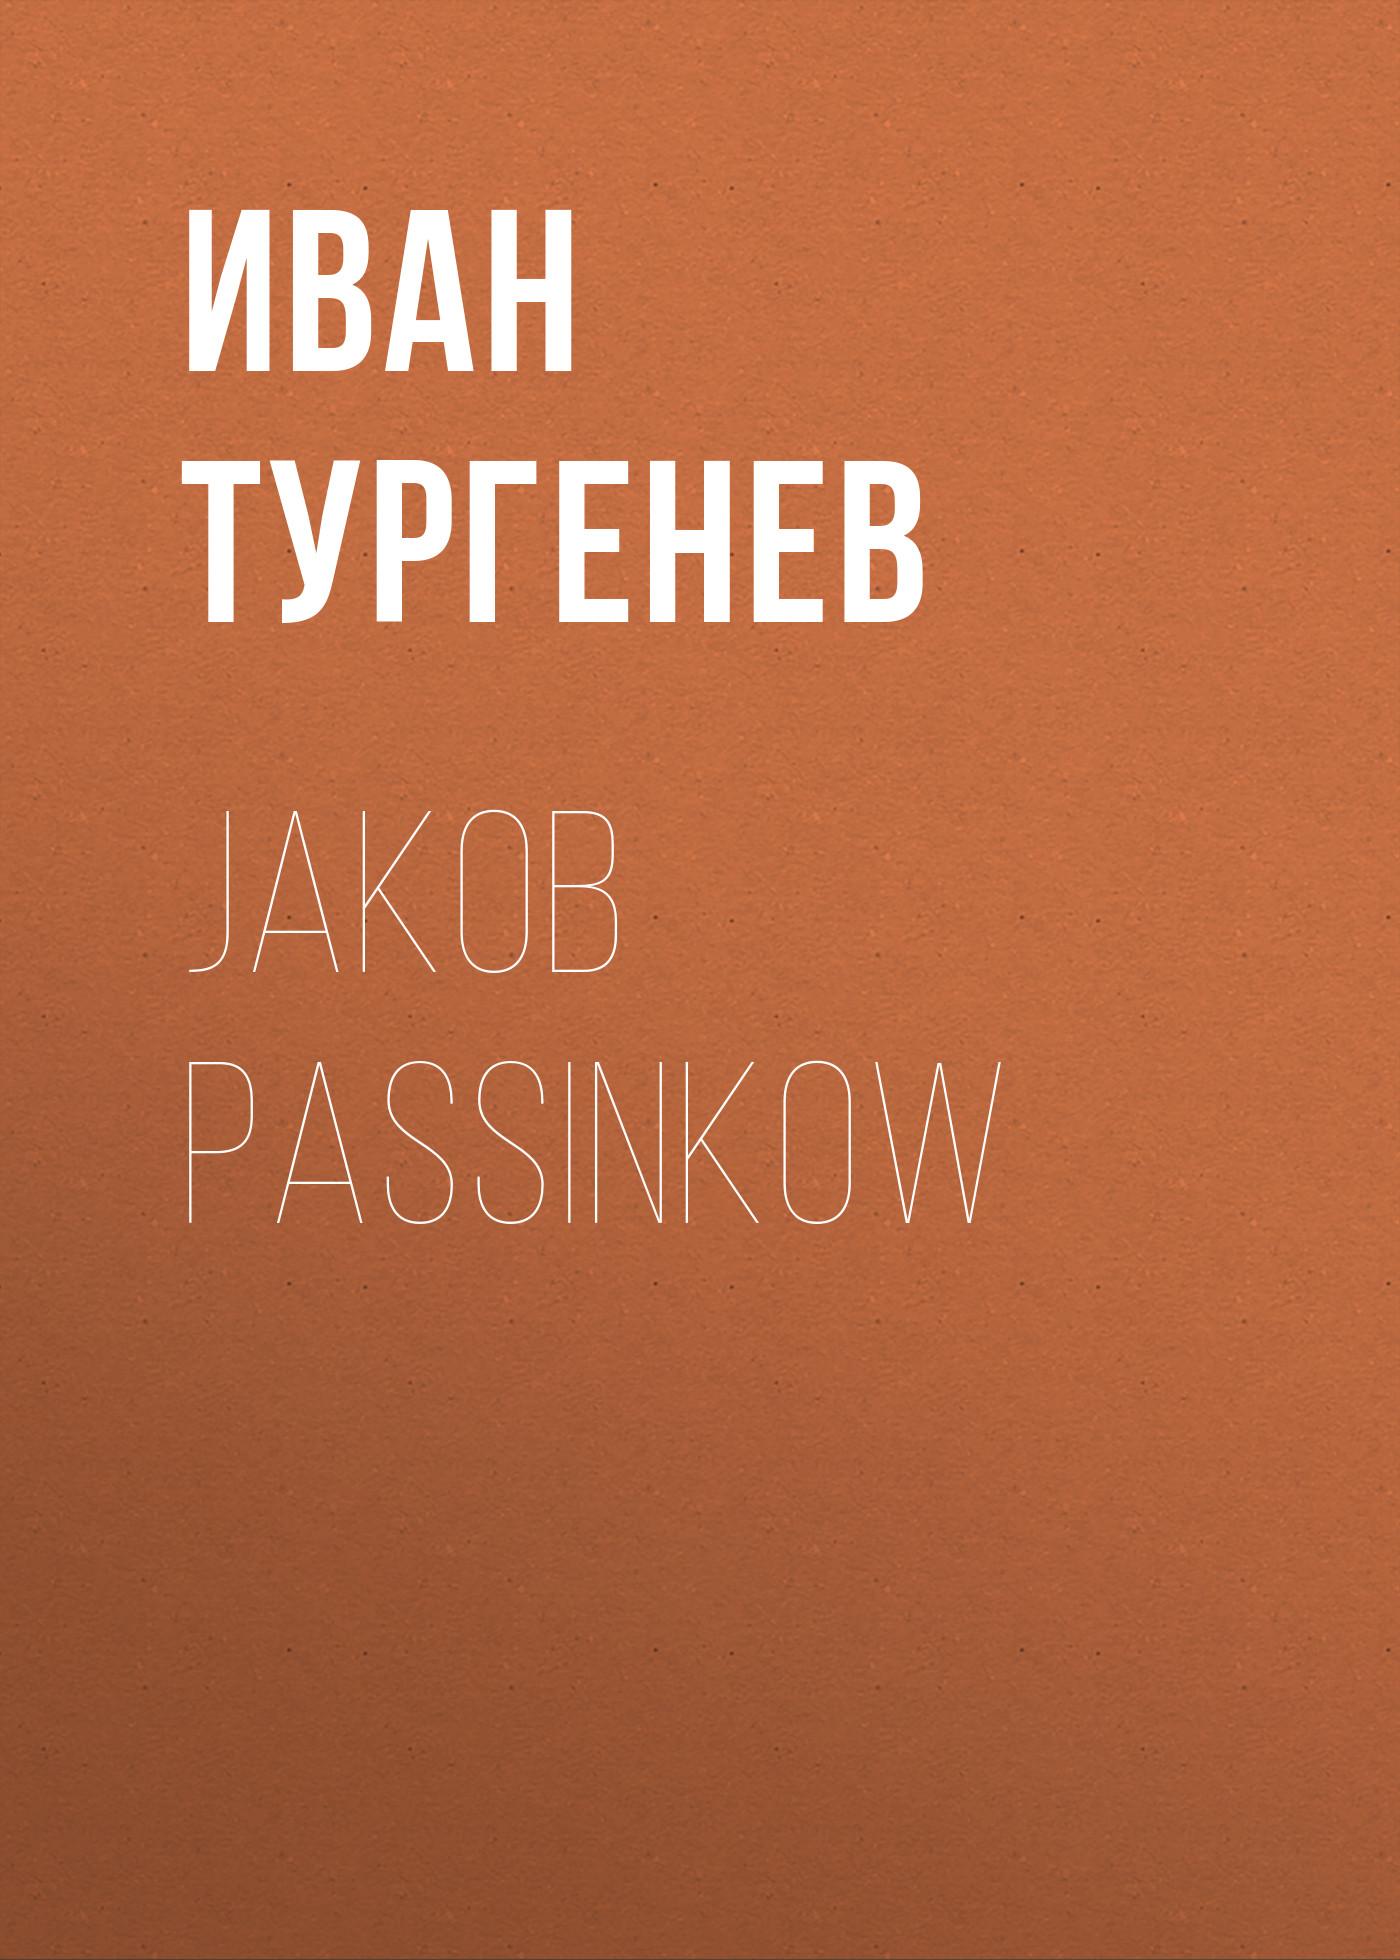 jakob passinkow